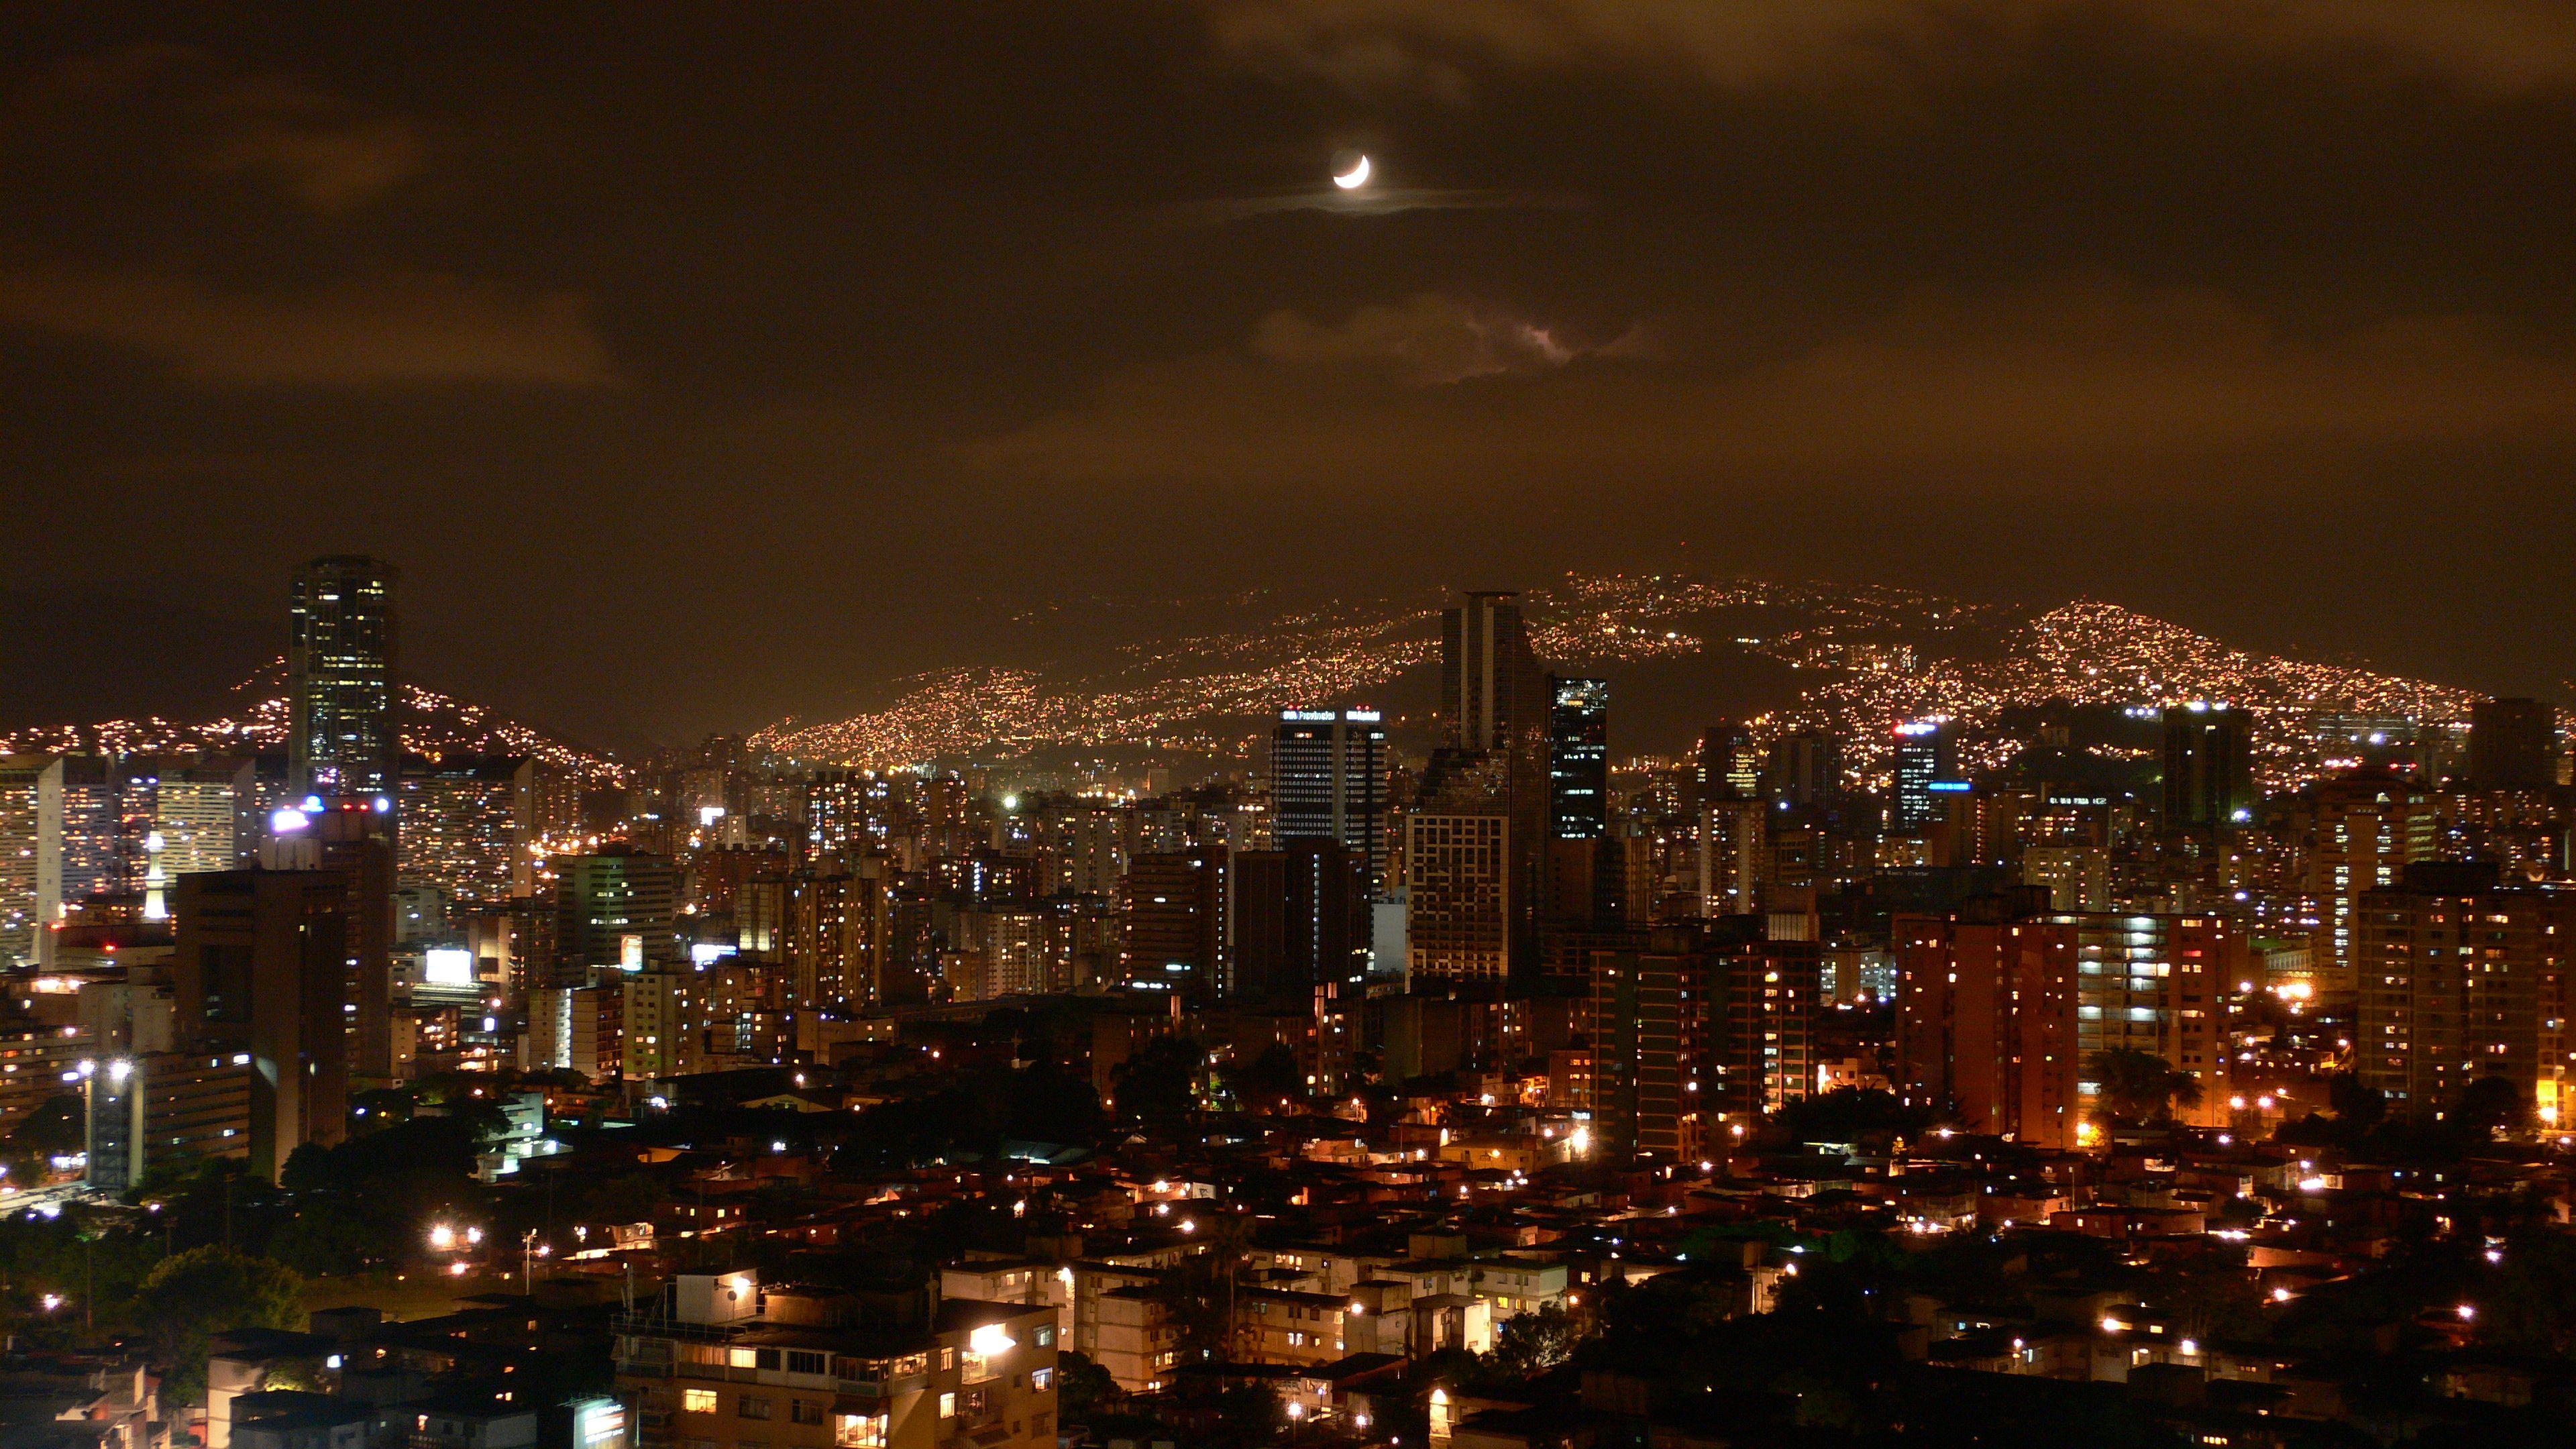 Caracas nocturna ! Venezuela Caracas-at-night.jpg (3840×2160 ...